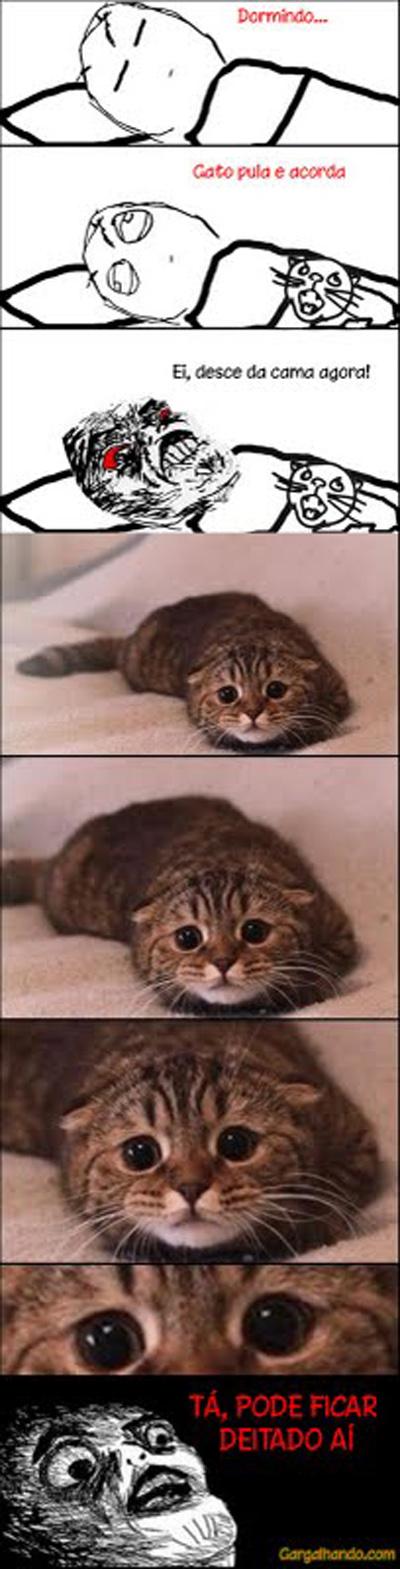 Eu gato desce da cama AGORA !!!